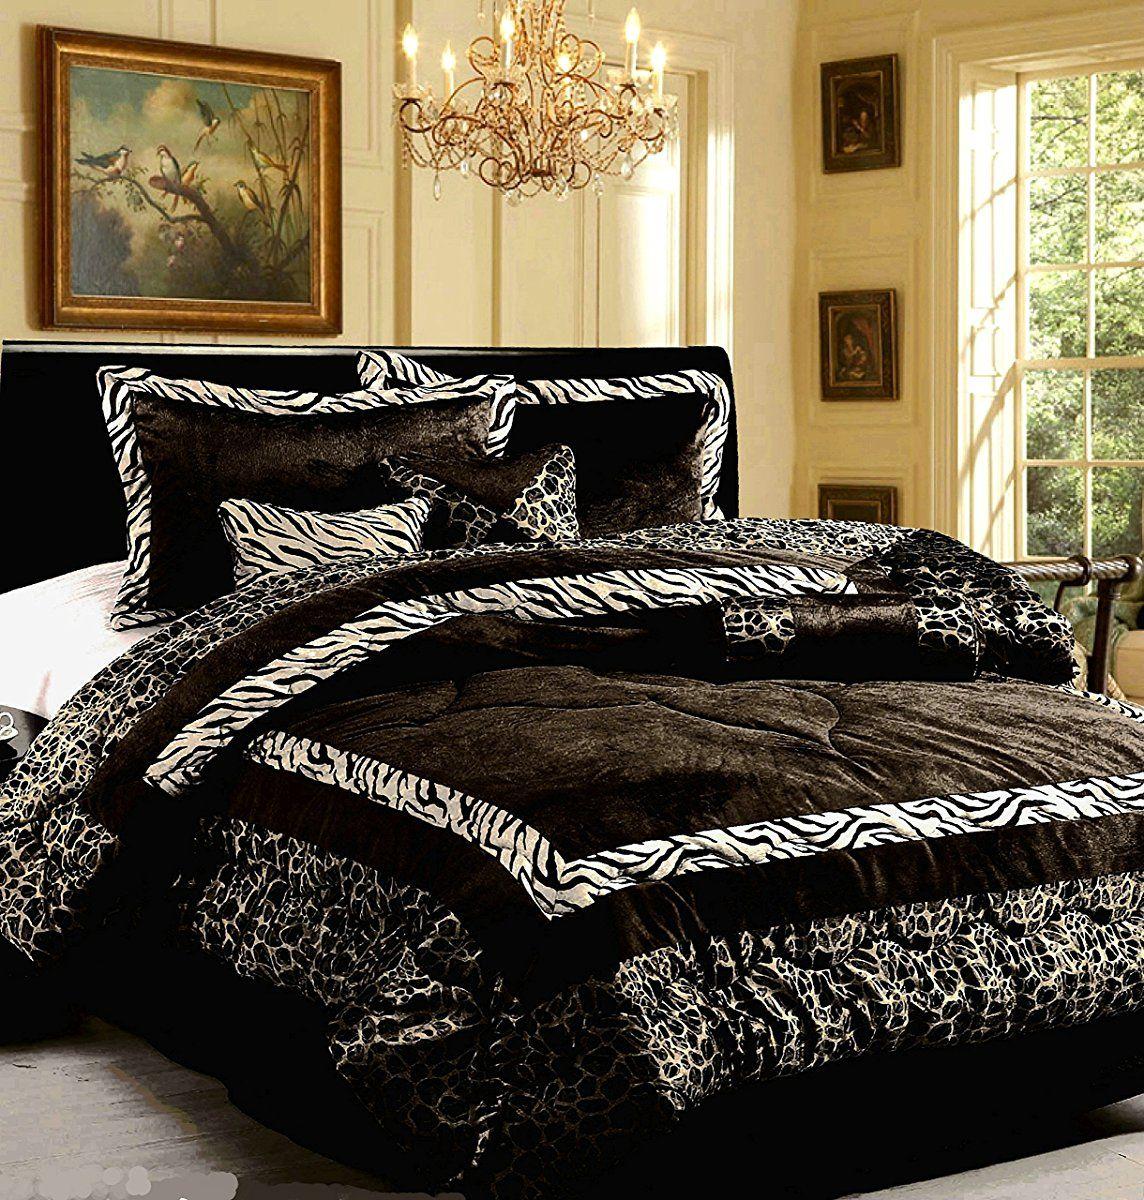 Dovedote Safarina Zebra Animal Print Comforter Set Queen Black